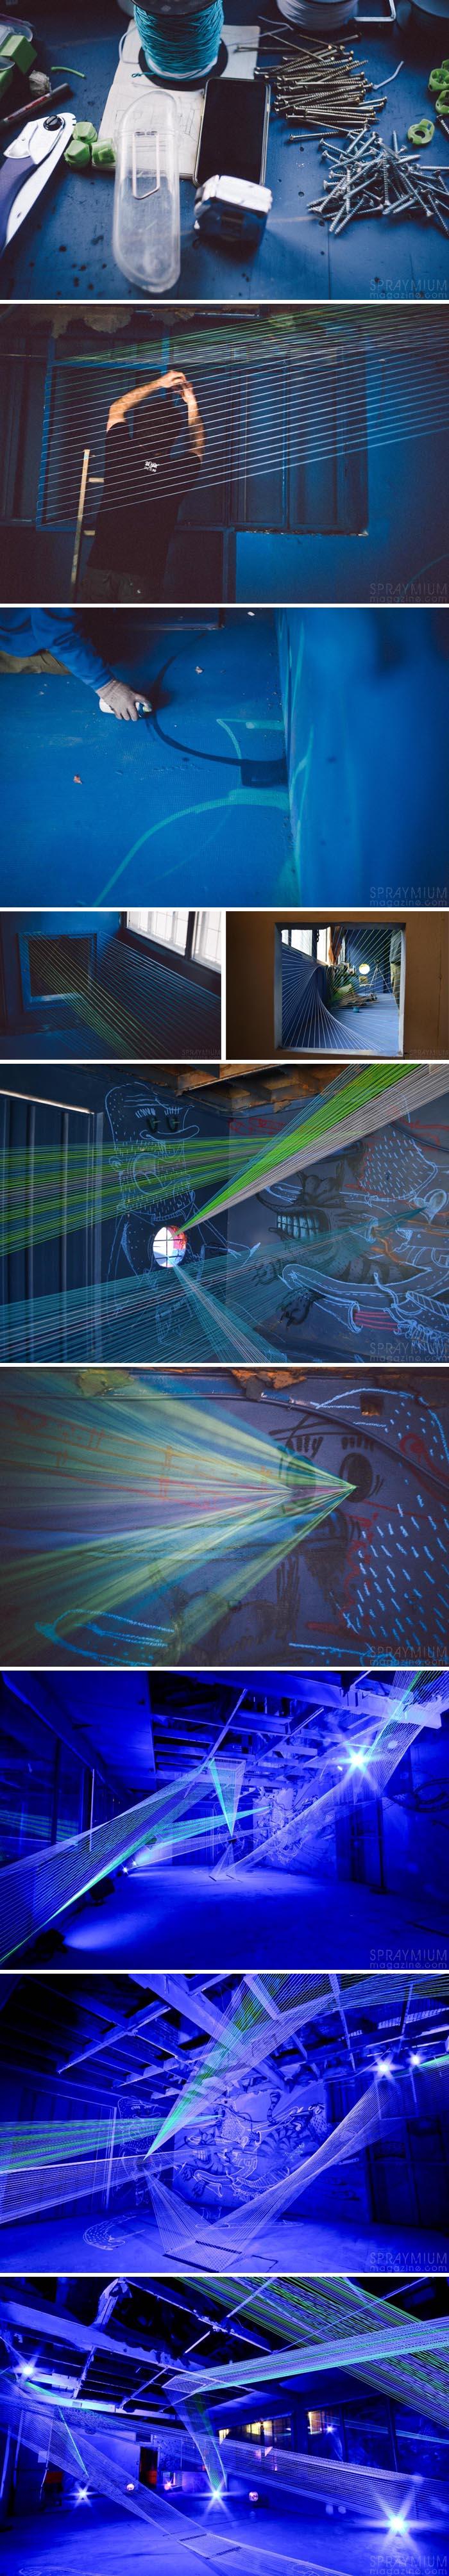 exposition mister freeze toulouse art urbain contemporain graffiti postgraffiti streetart muralism spraymium alexone preschoux